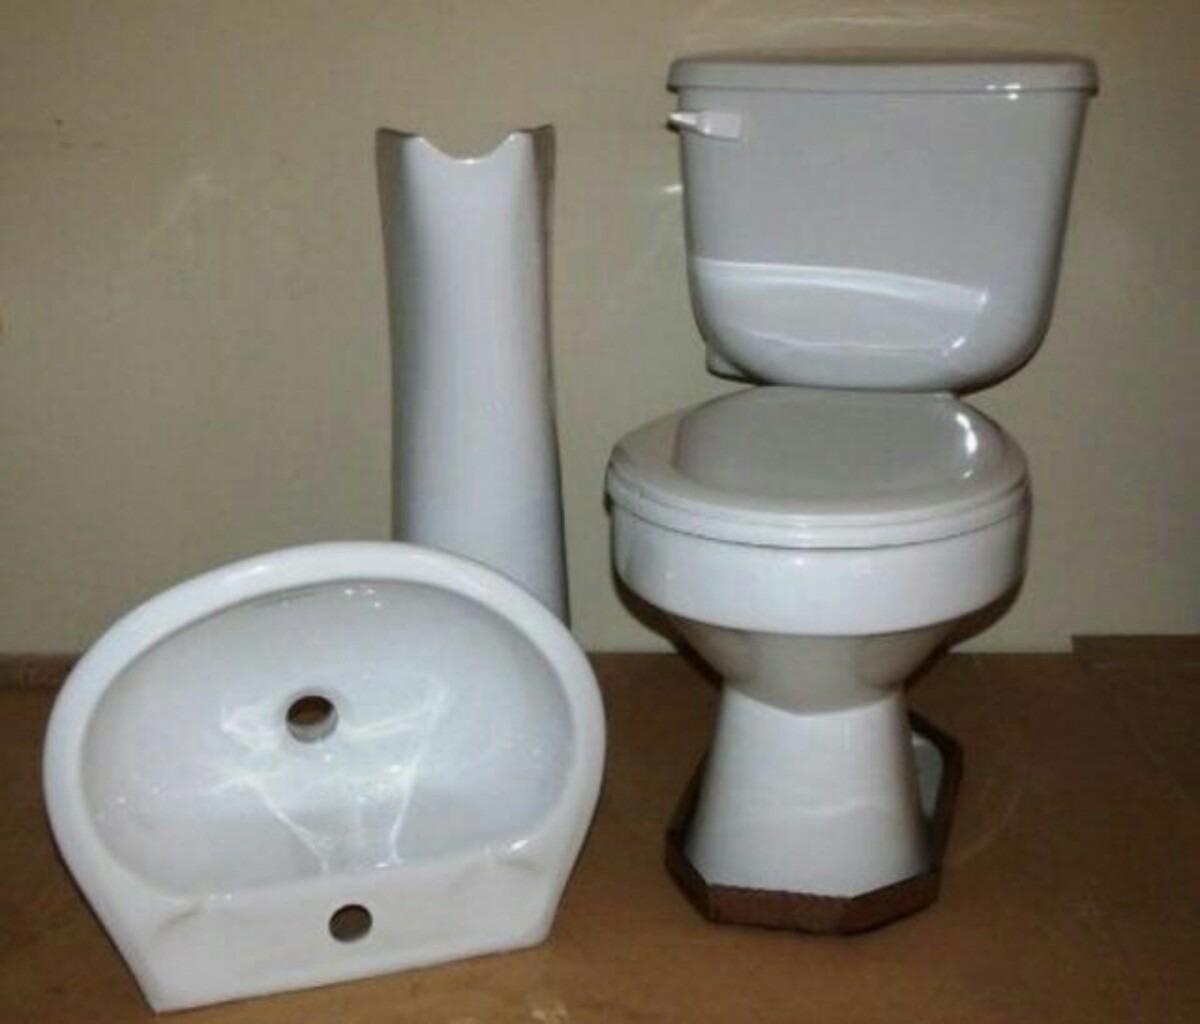 sala de ba o economica poceta lavamano bs